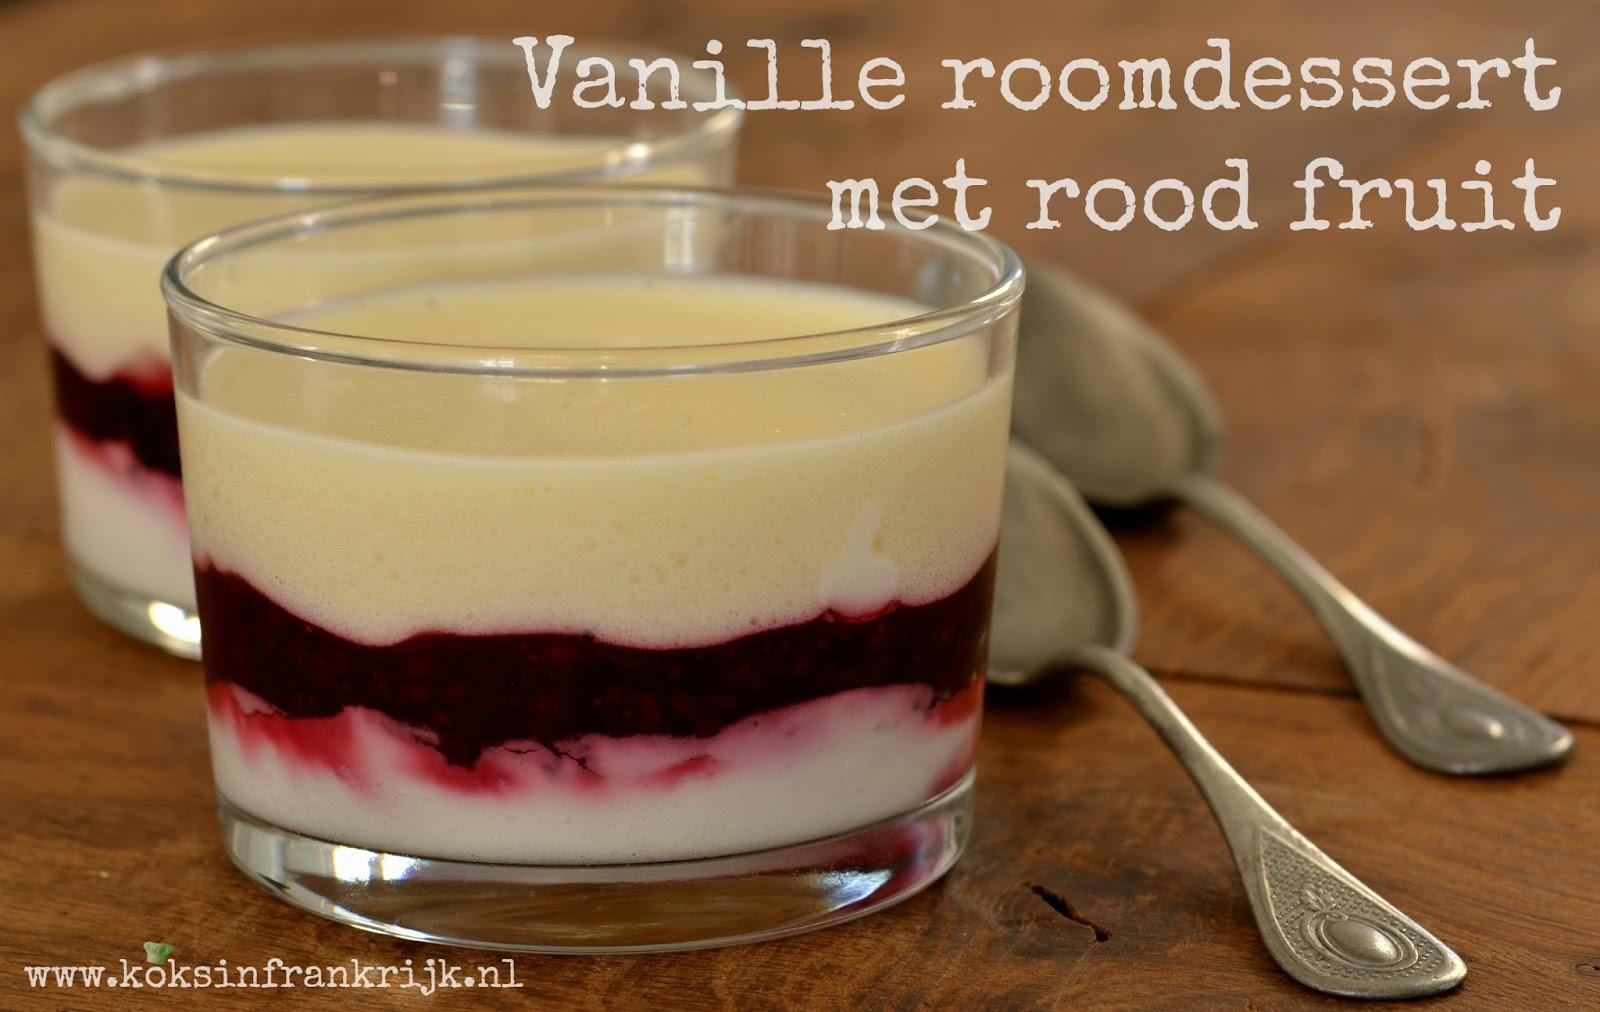 Dessert met mascarpone, vanille, gele room en rood fruit.